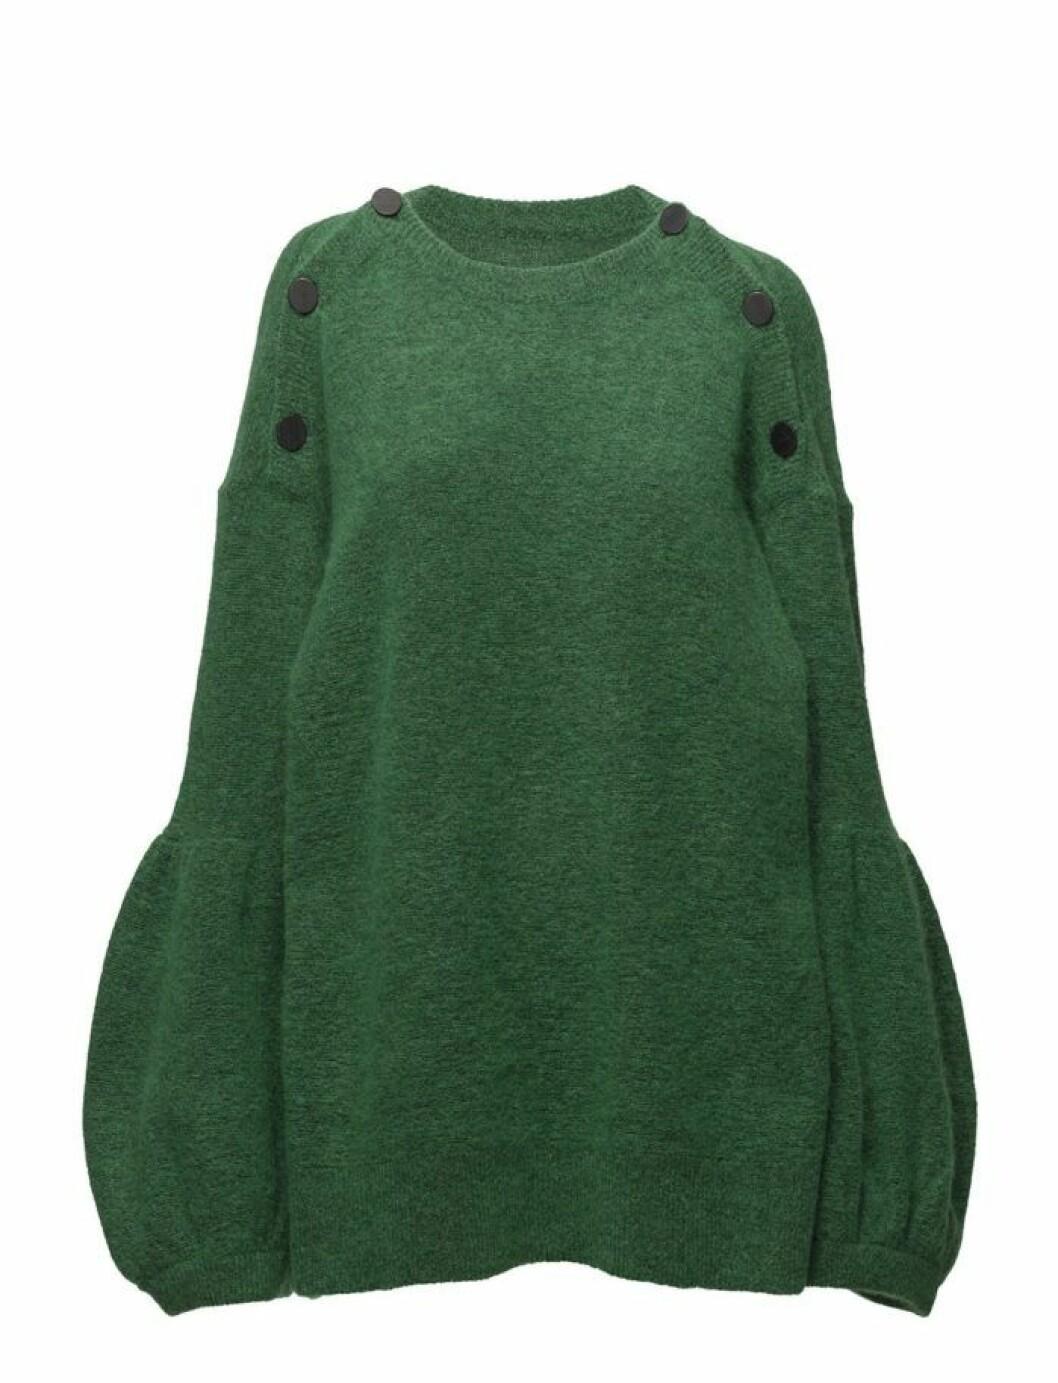 Mörkgrön stickad tröja från Malene Birger